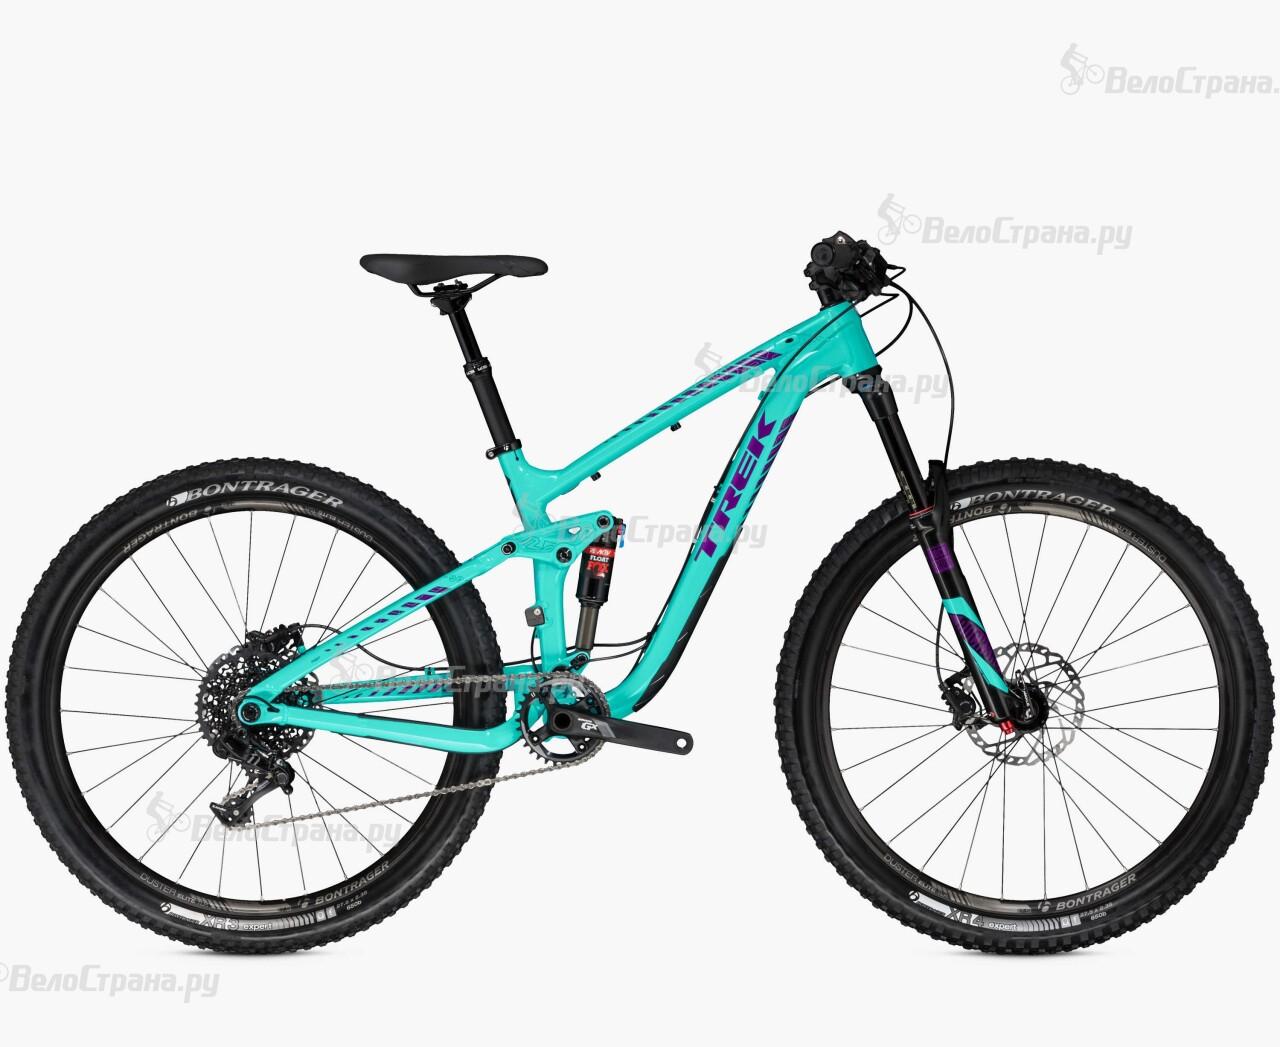 купить Велосипед Trek Remedy 8 27.5 Women's (2016) недорого